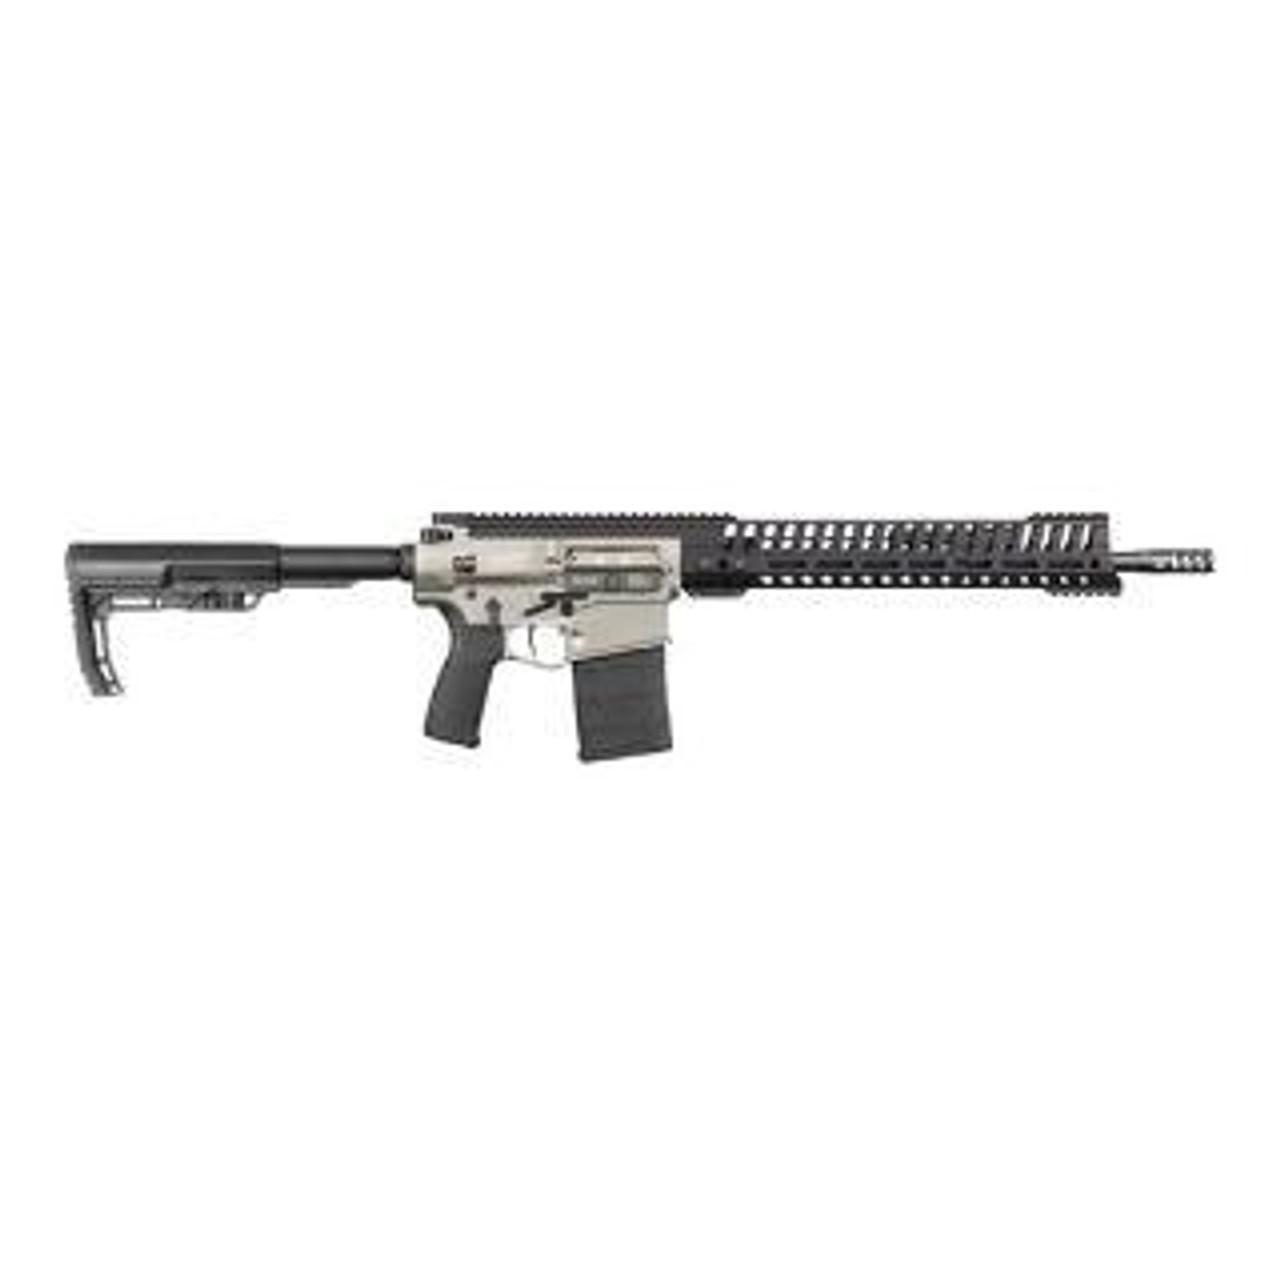 POF P-308 Edge Gen4 16in CALIFORNIA LEGAL -.308- NP3